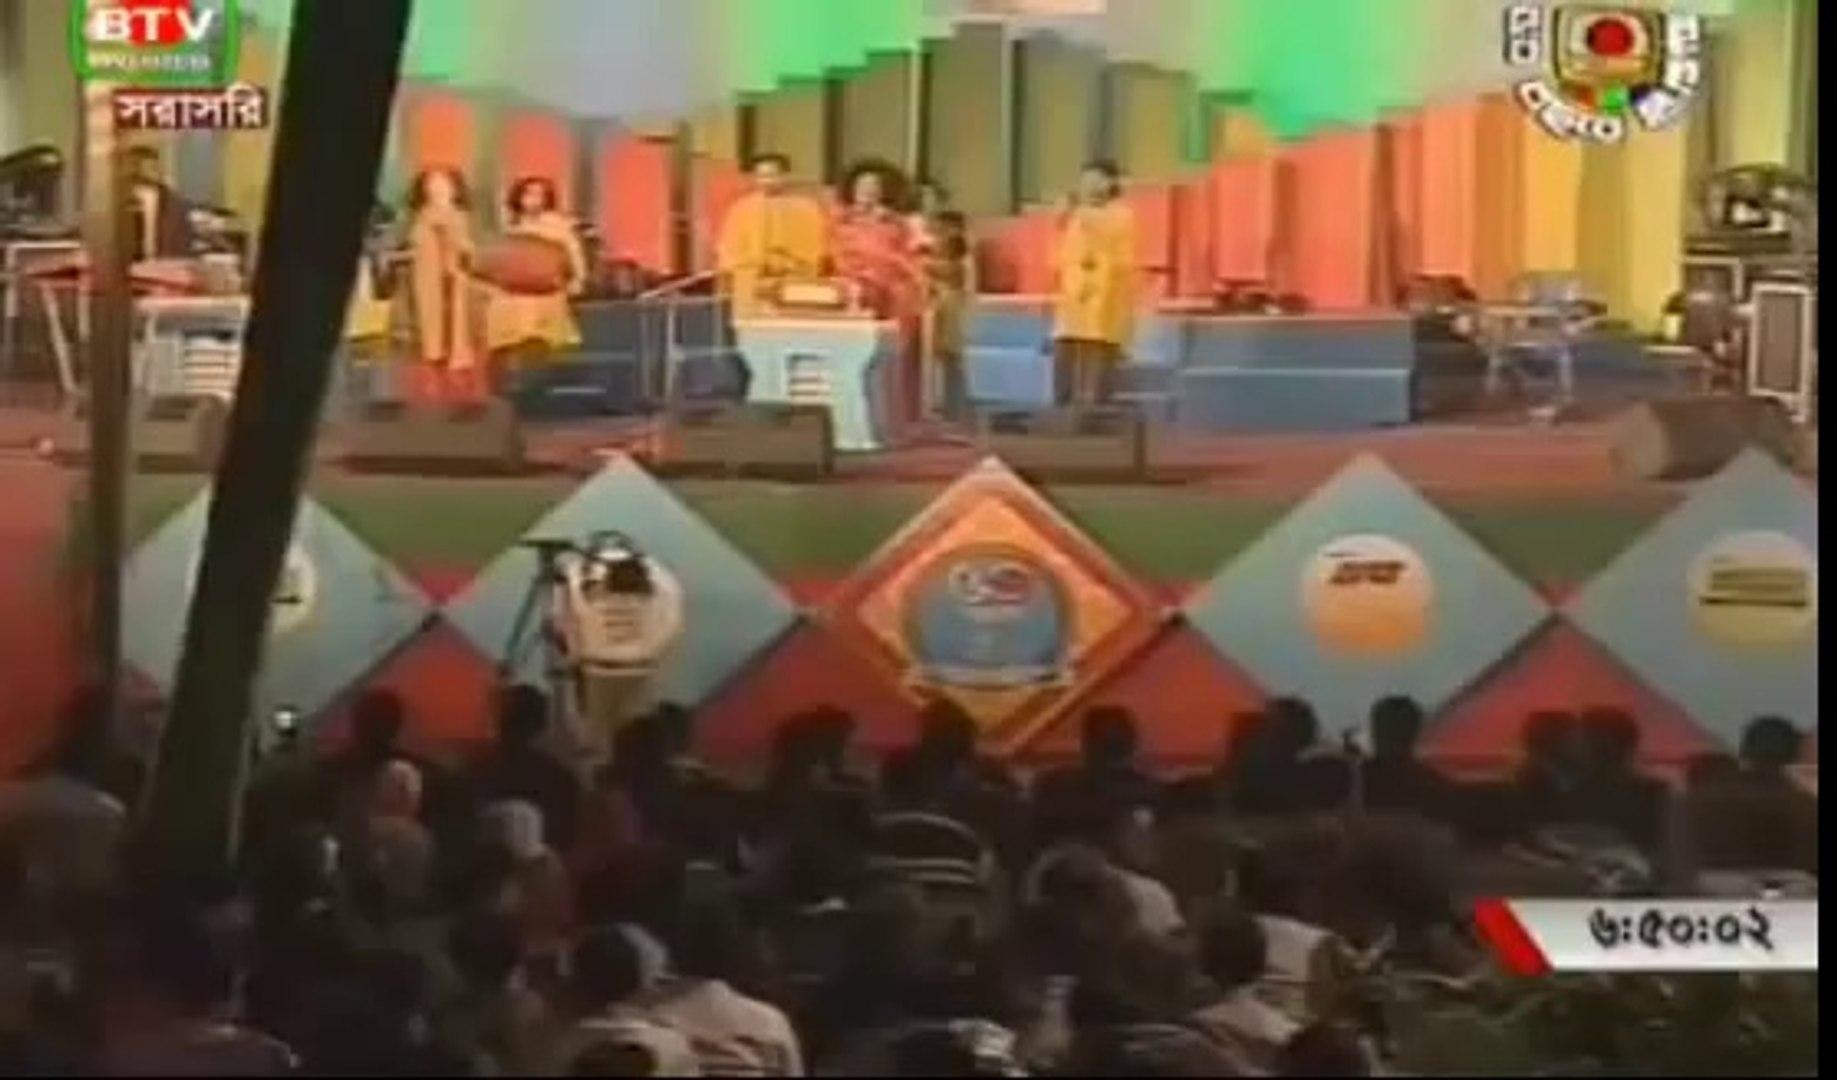 btv 50 years furti abdul kuddus boyati live bangla baul